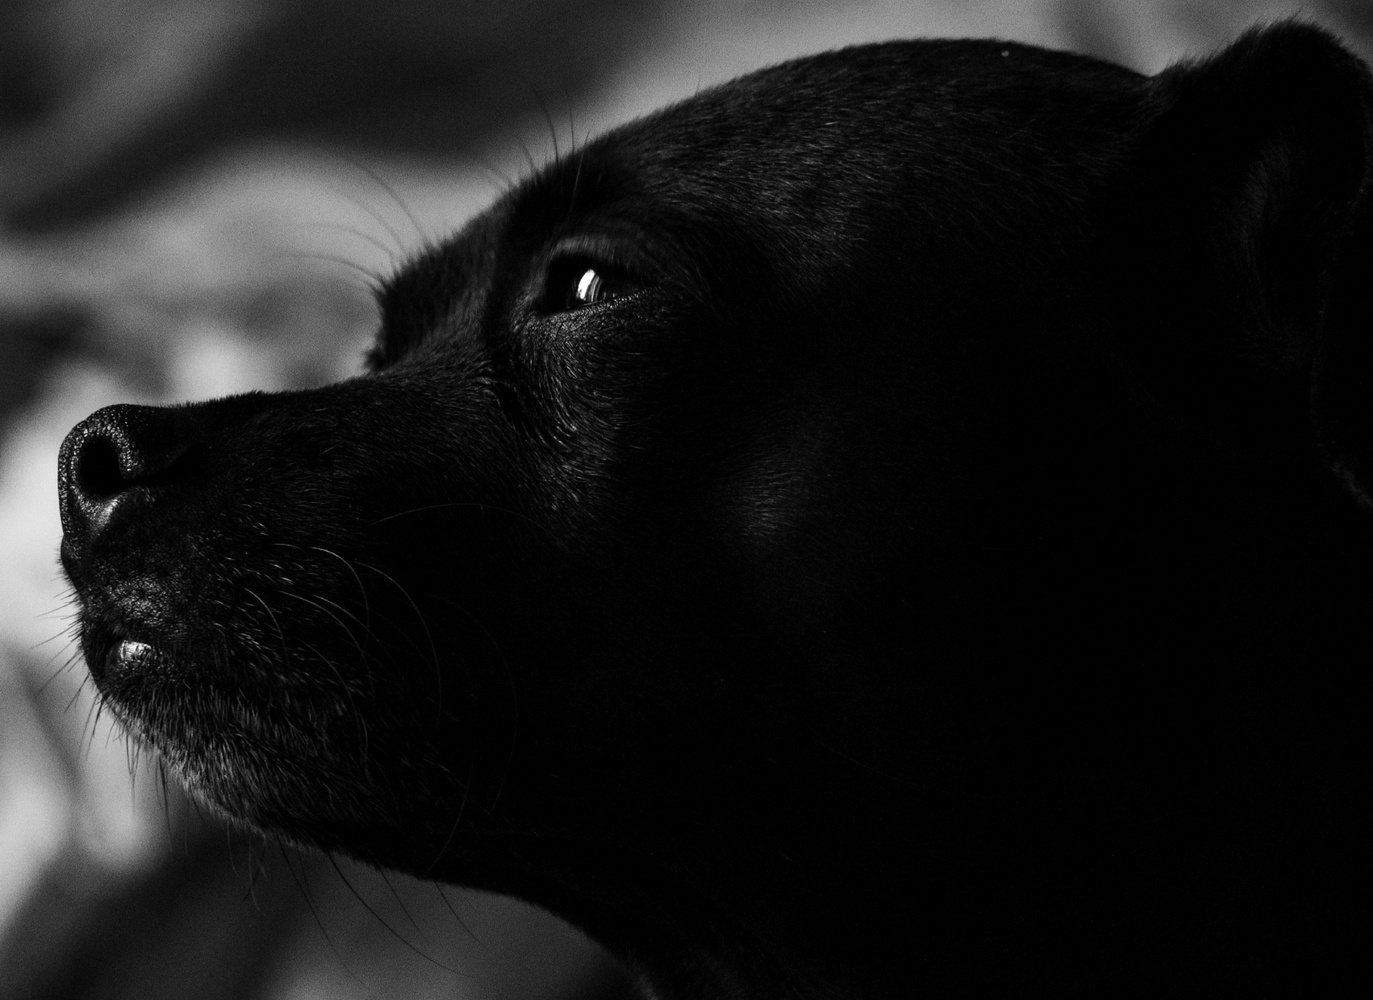 Doggy closeup by Marlon Powell